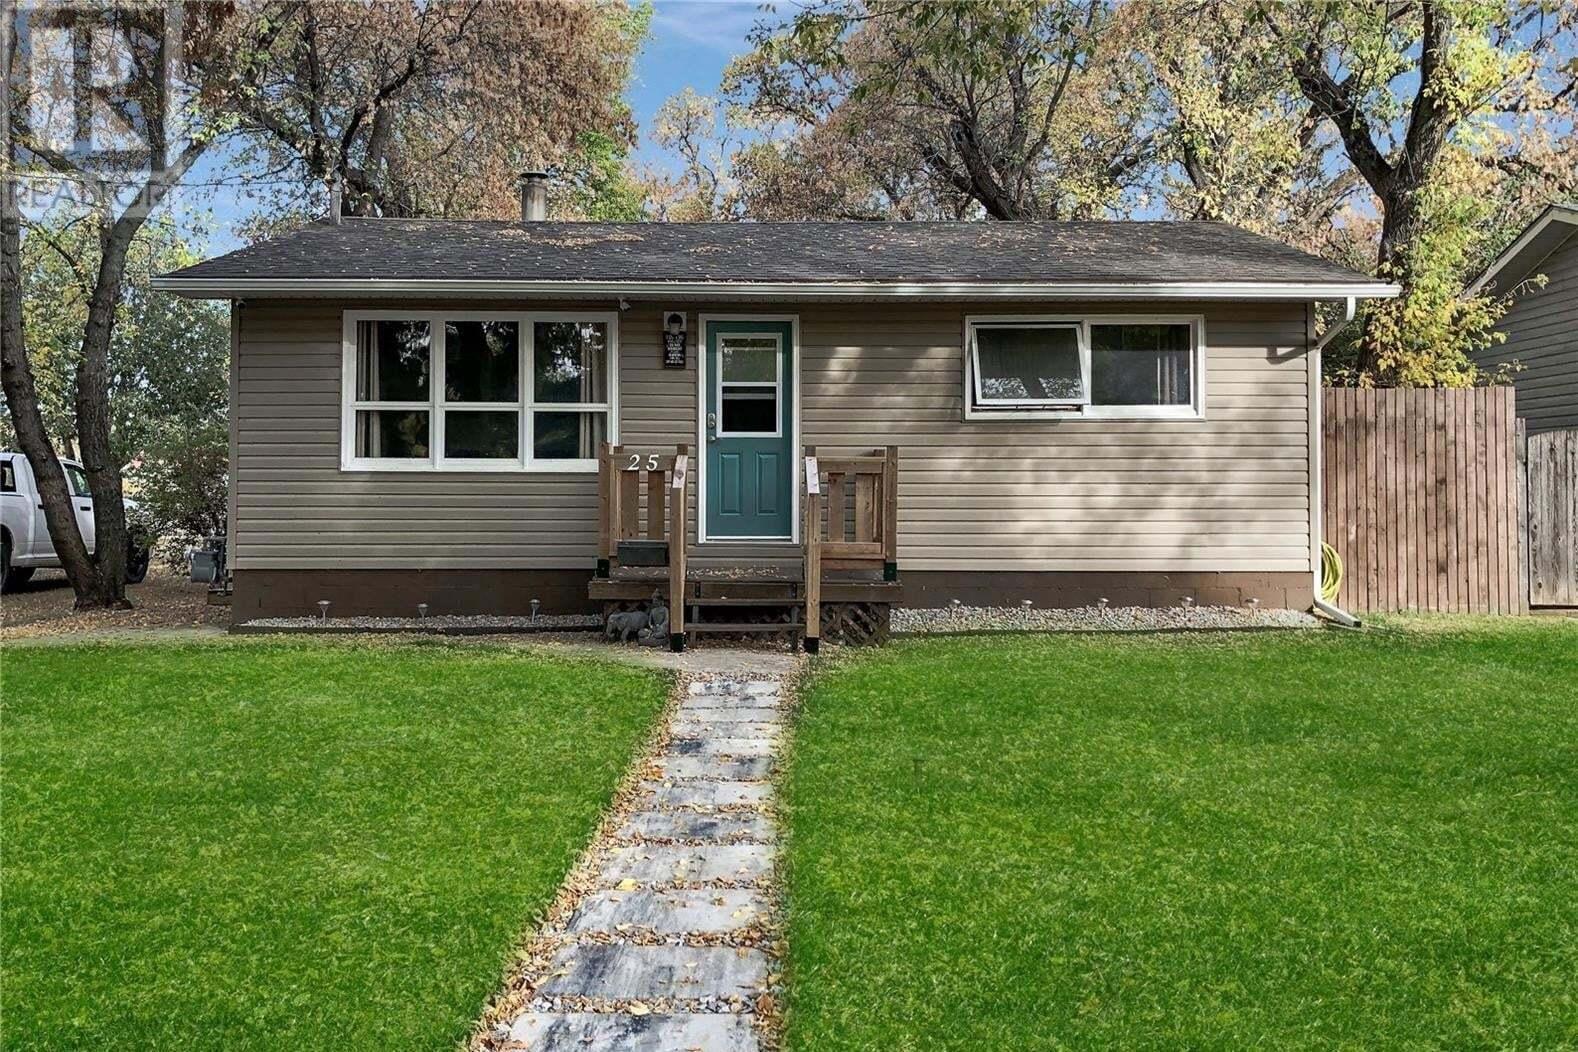 House for sale at 25 11th Ave SE Swift Current Saskatchewan - MLS: SK828135